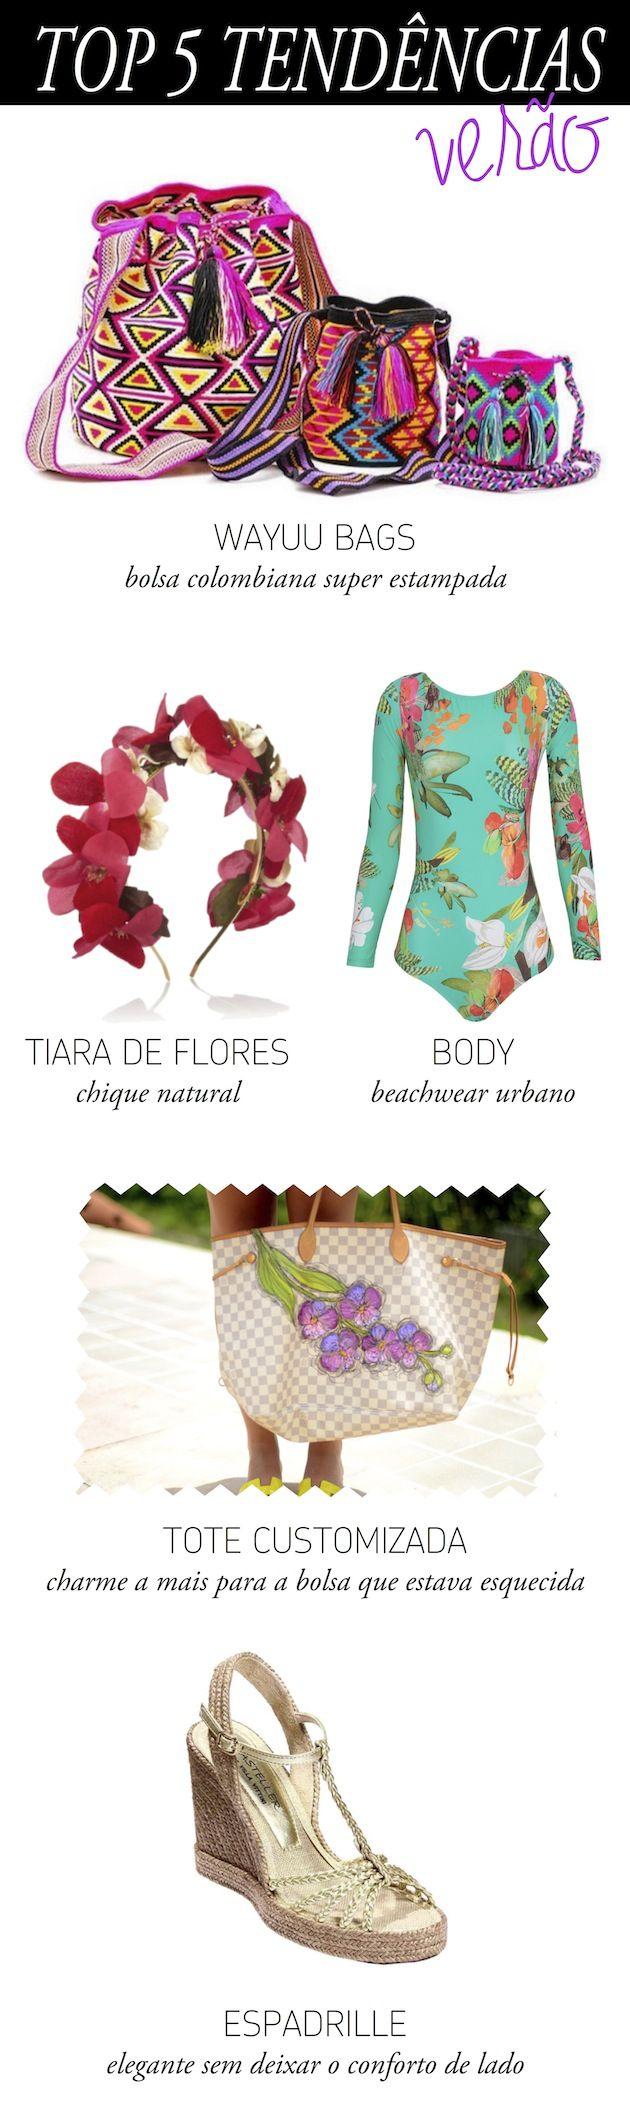 top-5-tendencias-verao-2014-wayuu-bag-bolsa-colombiana-tote-louis-vuitton-customizada-espadrille-anabela-tiara-de-flores-no-cabelo-body-agua...